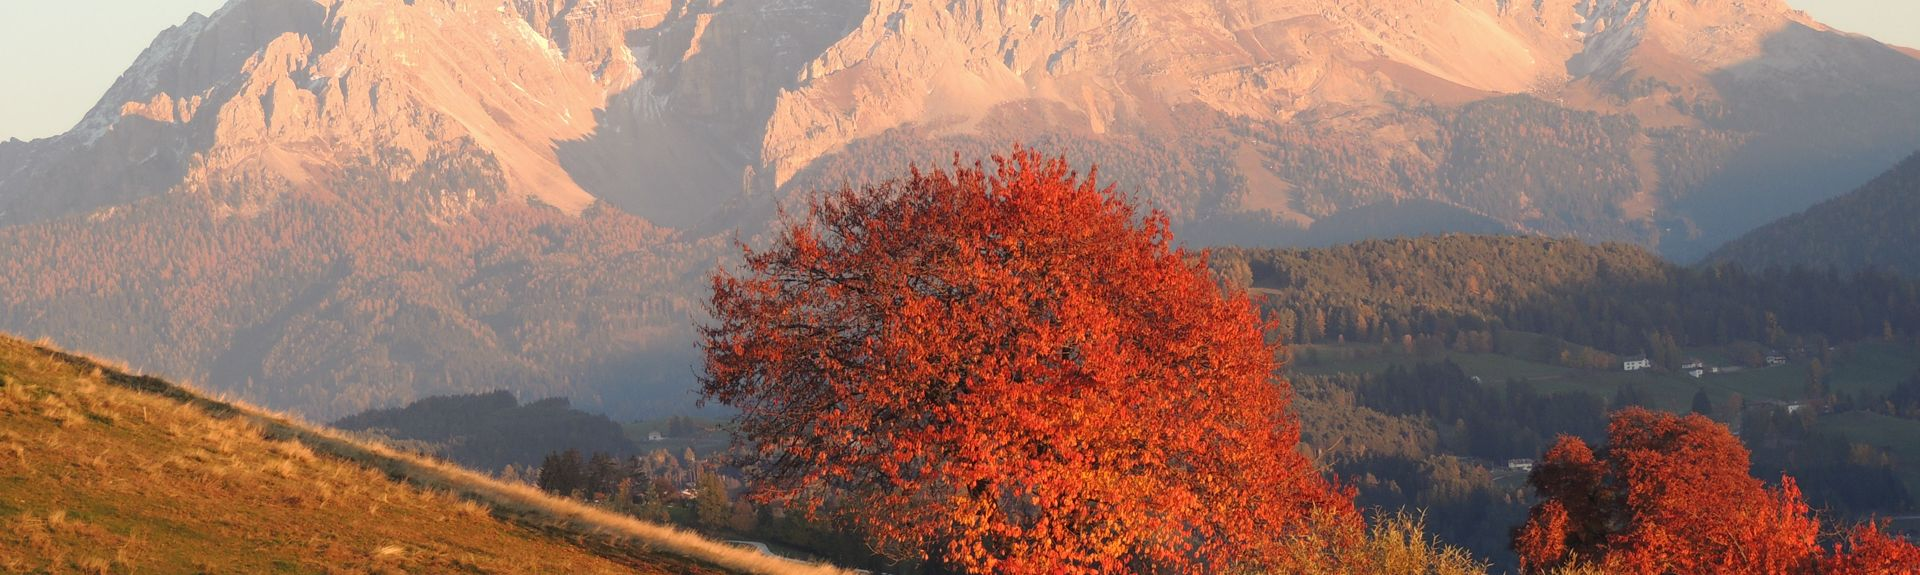 Redagno di Sopra, Alto Adige, Trentino-Alto Adige/South Tyrol, Italy